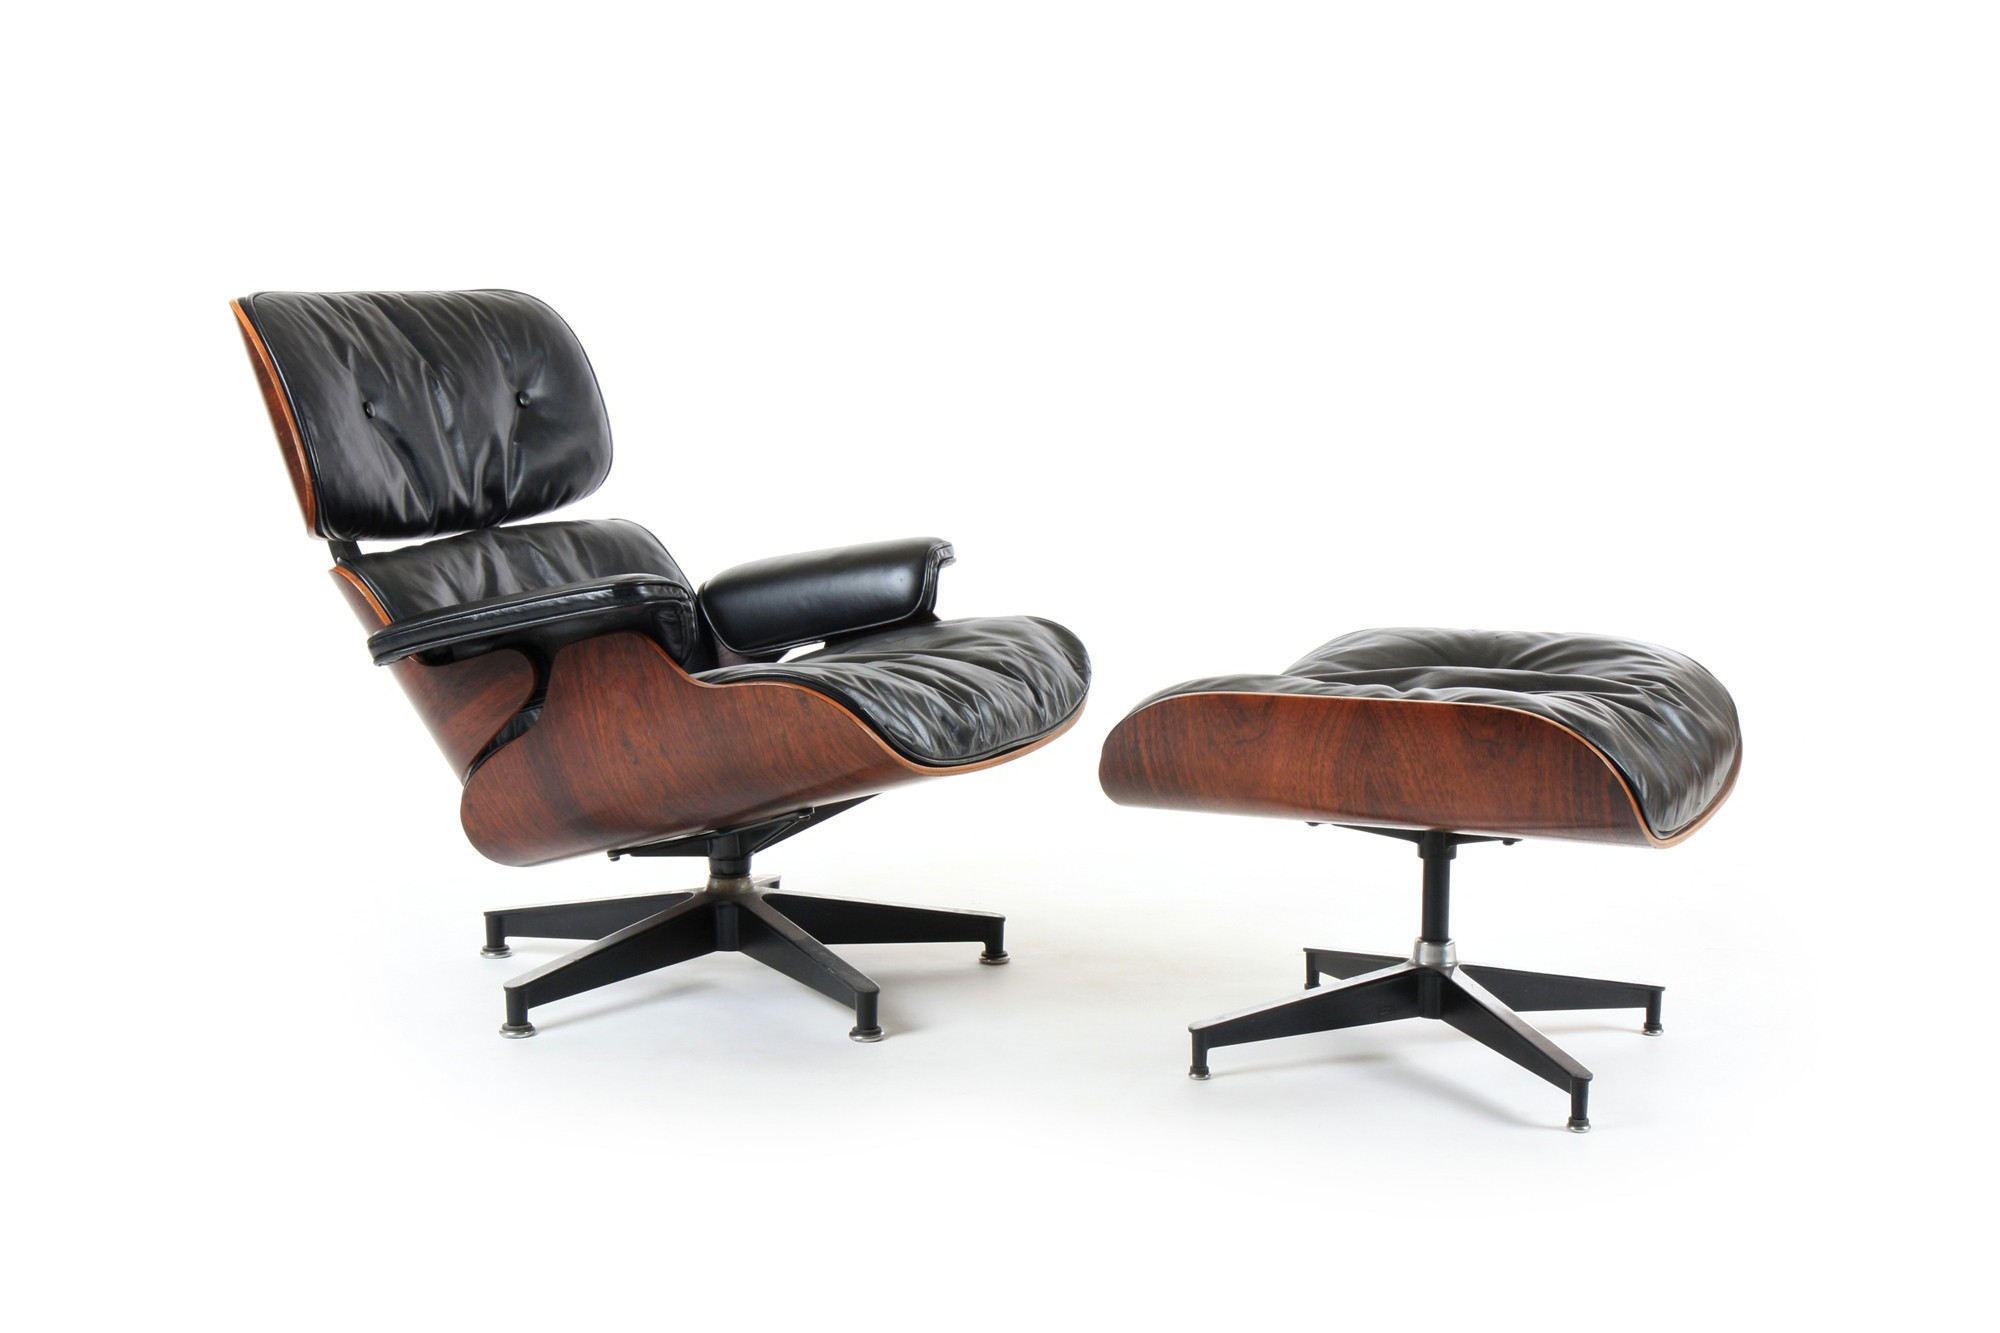 Vitra Lounge Chair Replica mr. bigglesworthy - mid century modern and designer retro